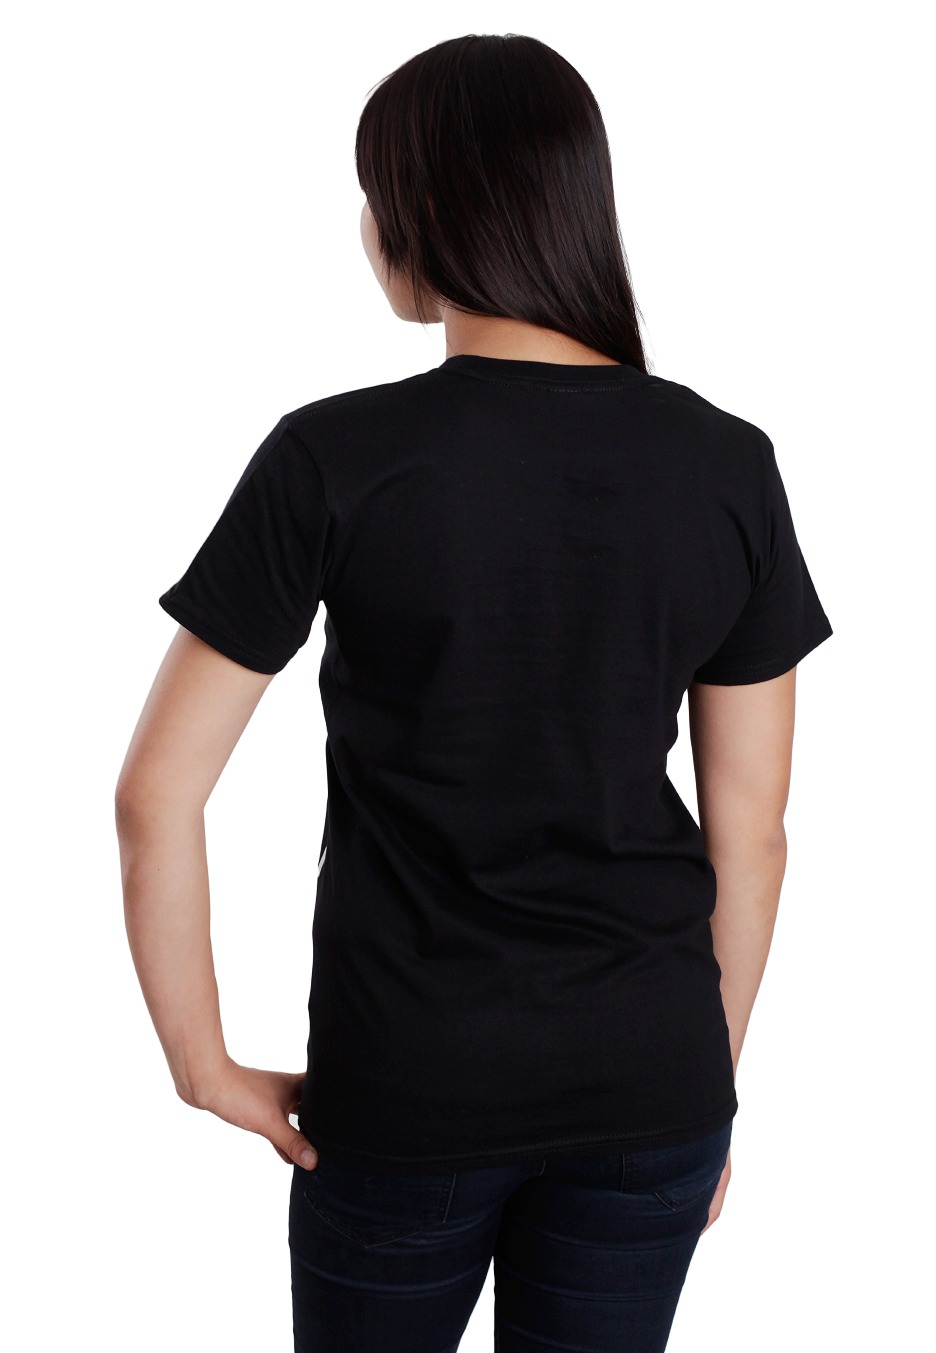 New Found Glory - Blocked - T-Shirt - Official Pop Punk Merchandise ... dd691f5fb